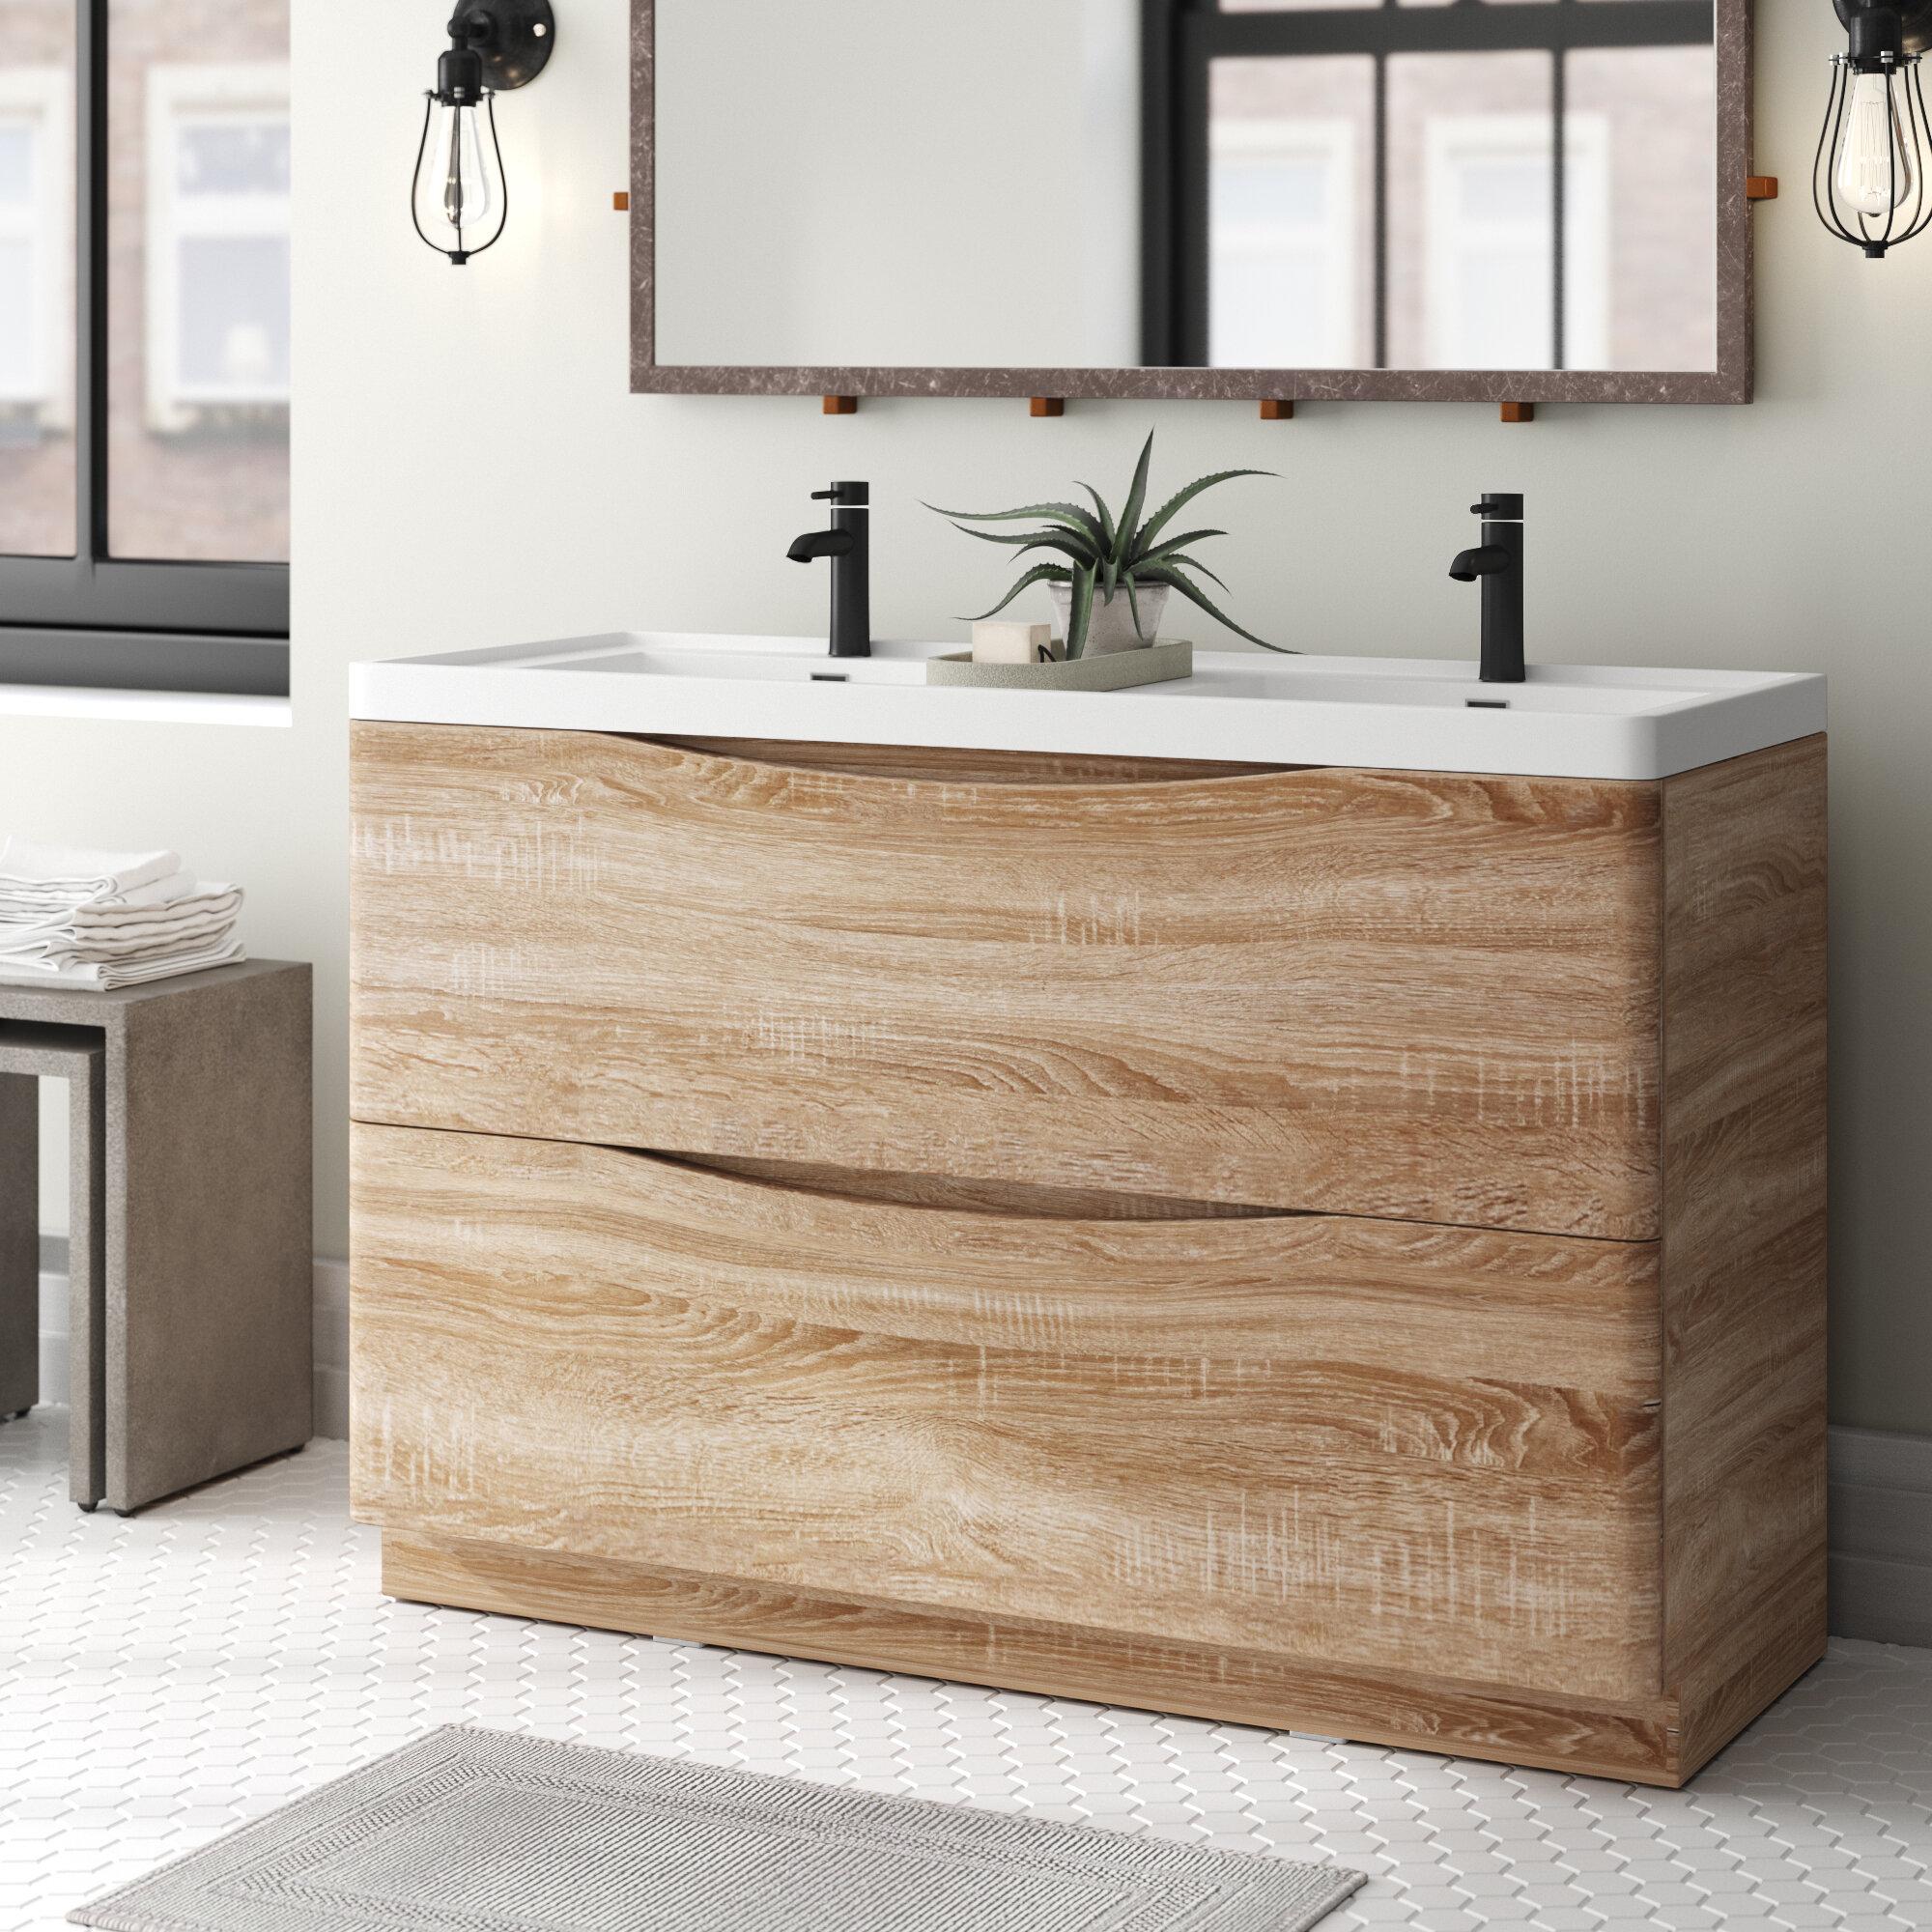 Blondene 48 Double Bathroom Vanity Set